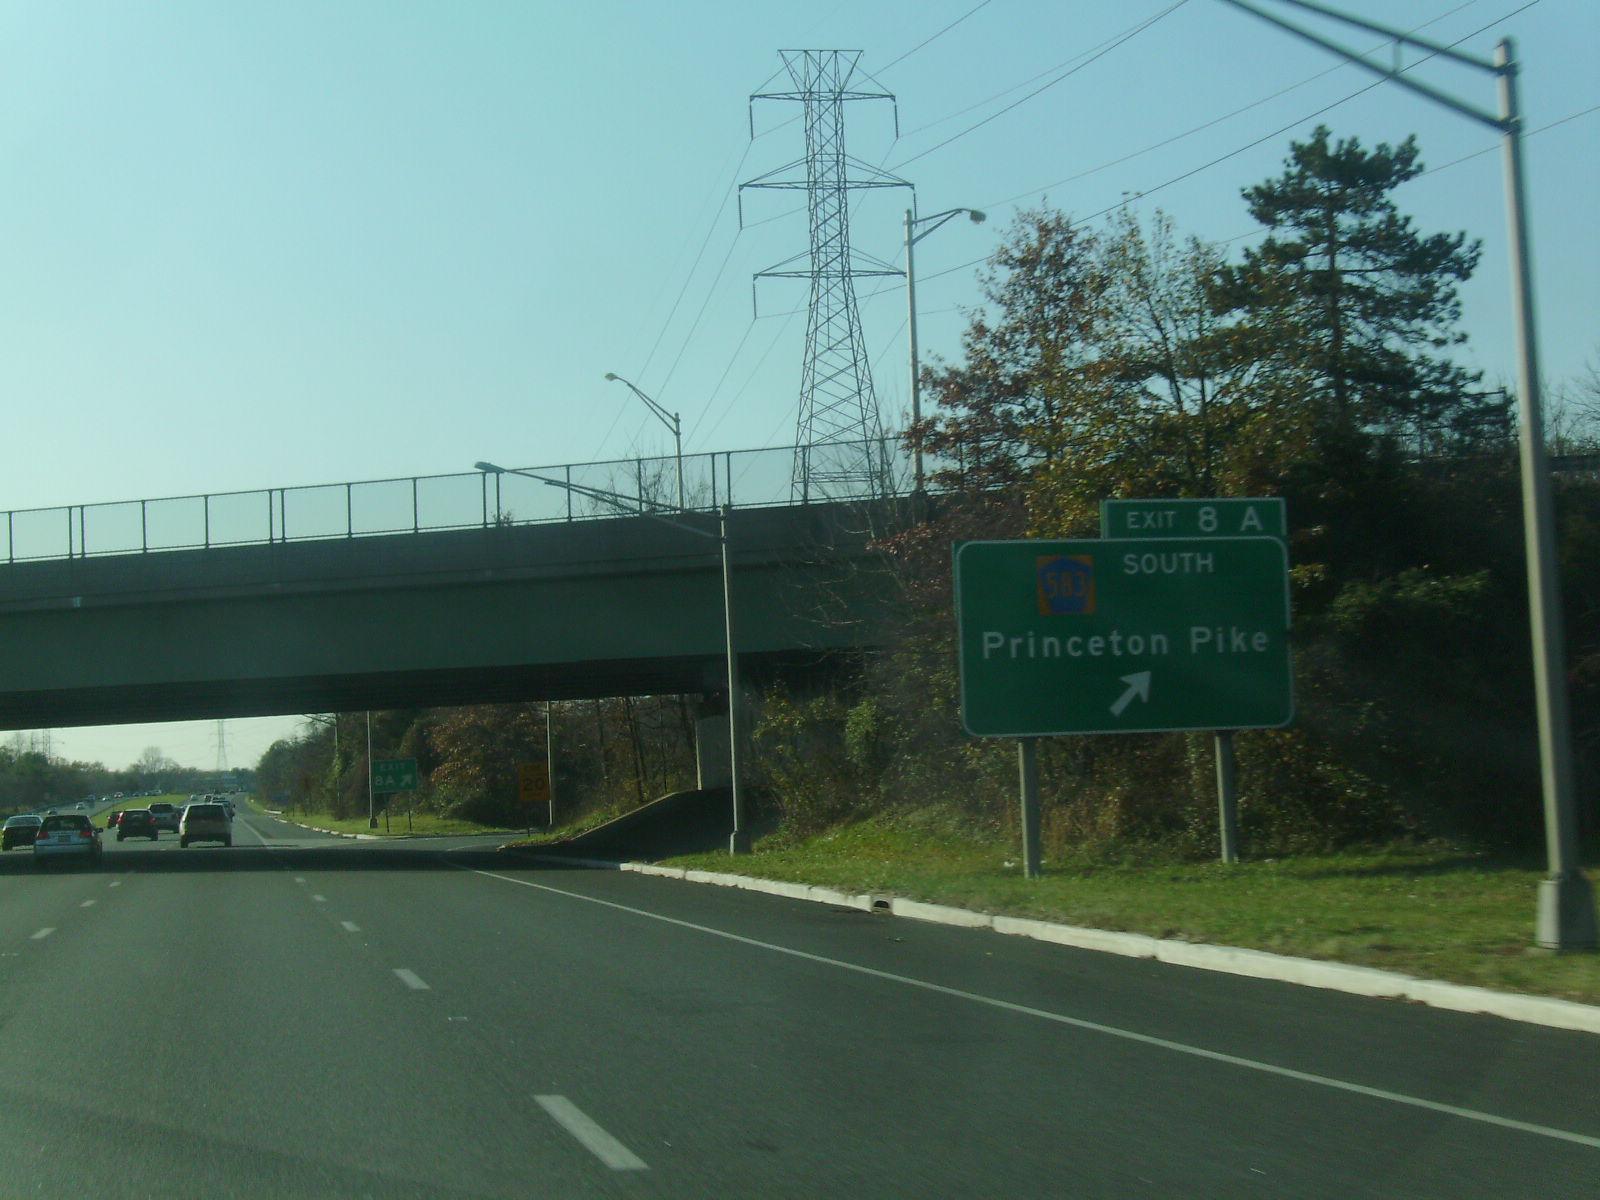 Depiction of Interestatal 95 en Nueva Jersey